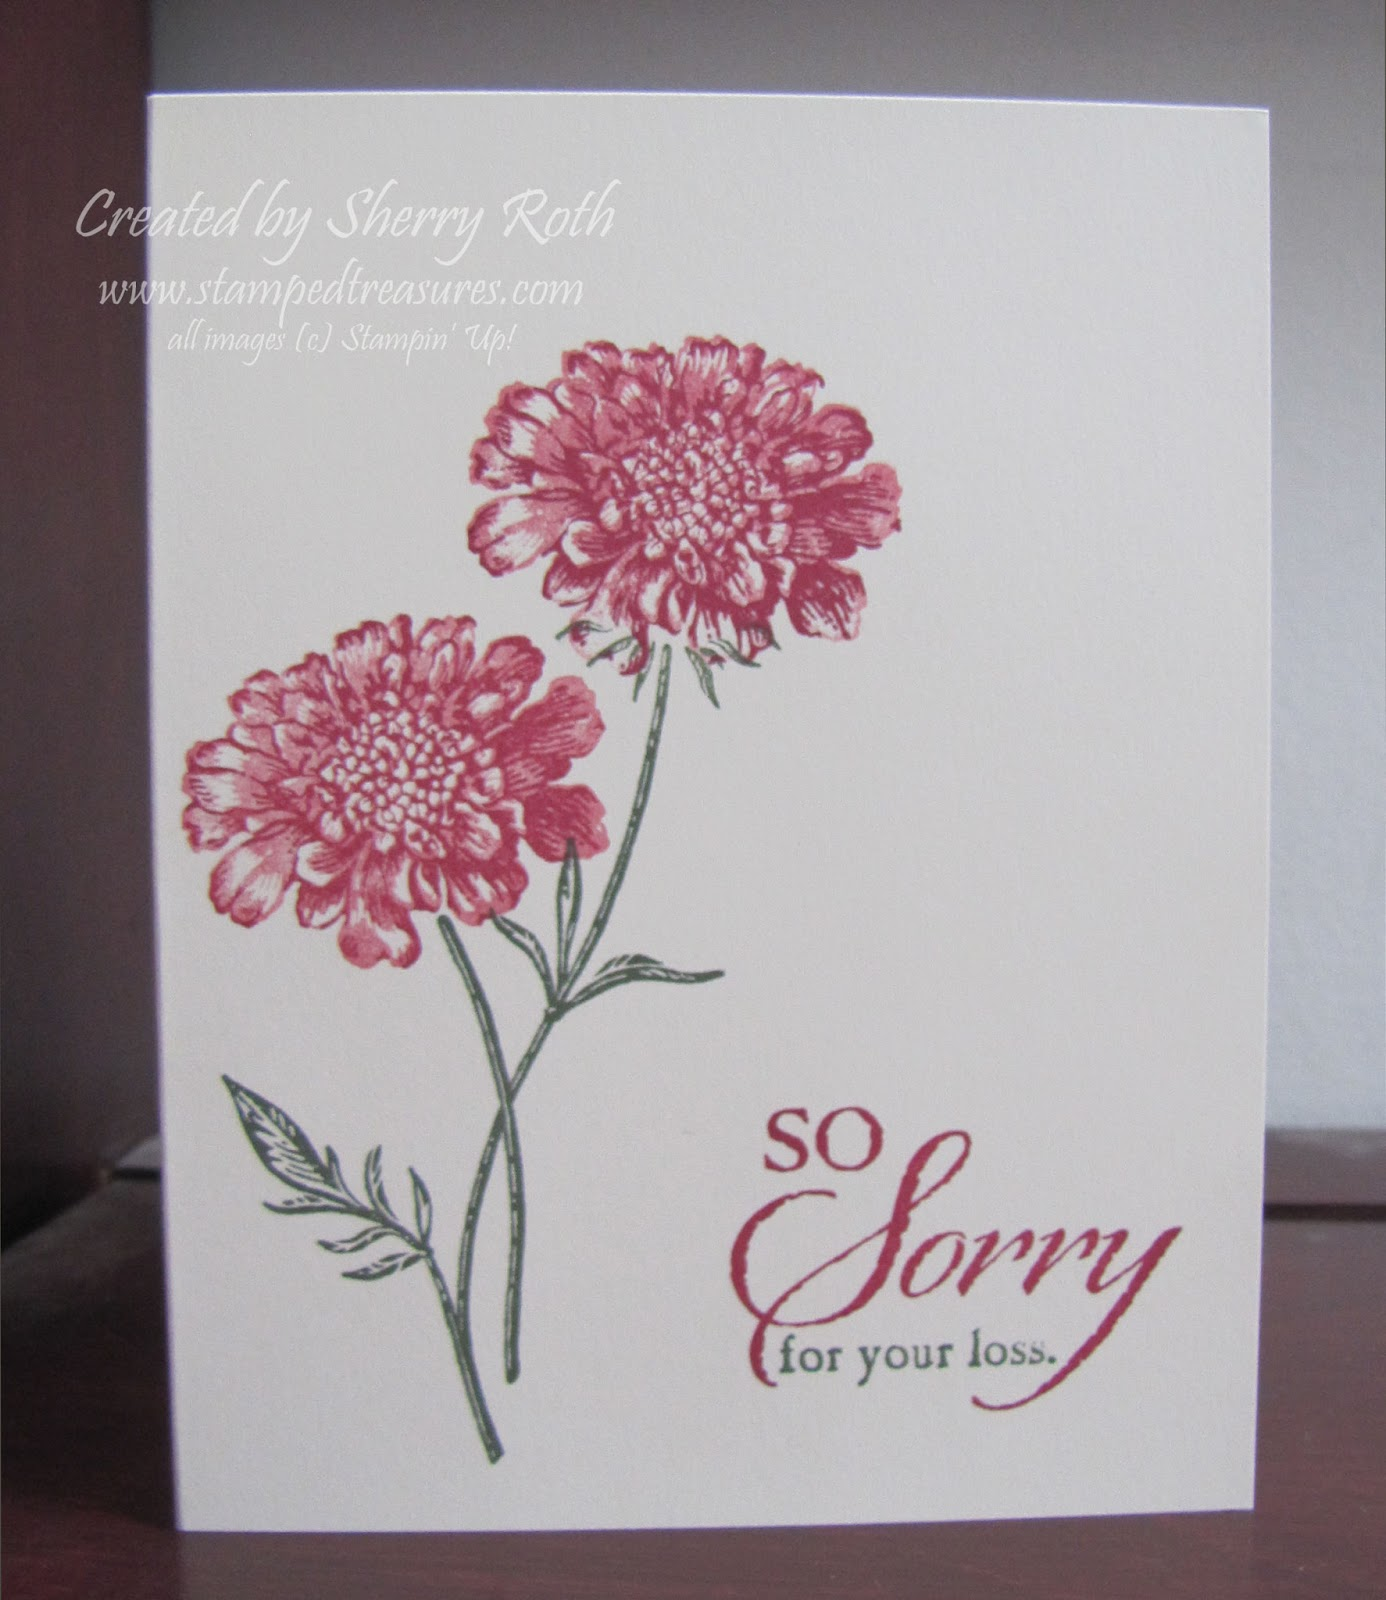 Sherrys Stamped Treasures Field Flowers Sympathy Card